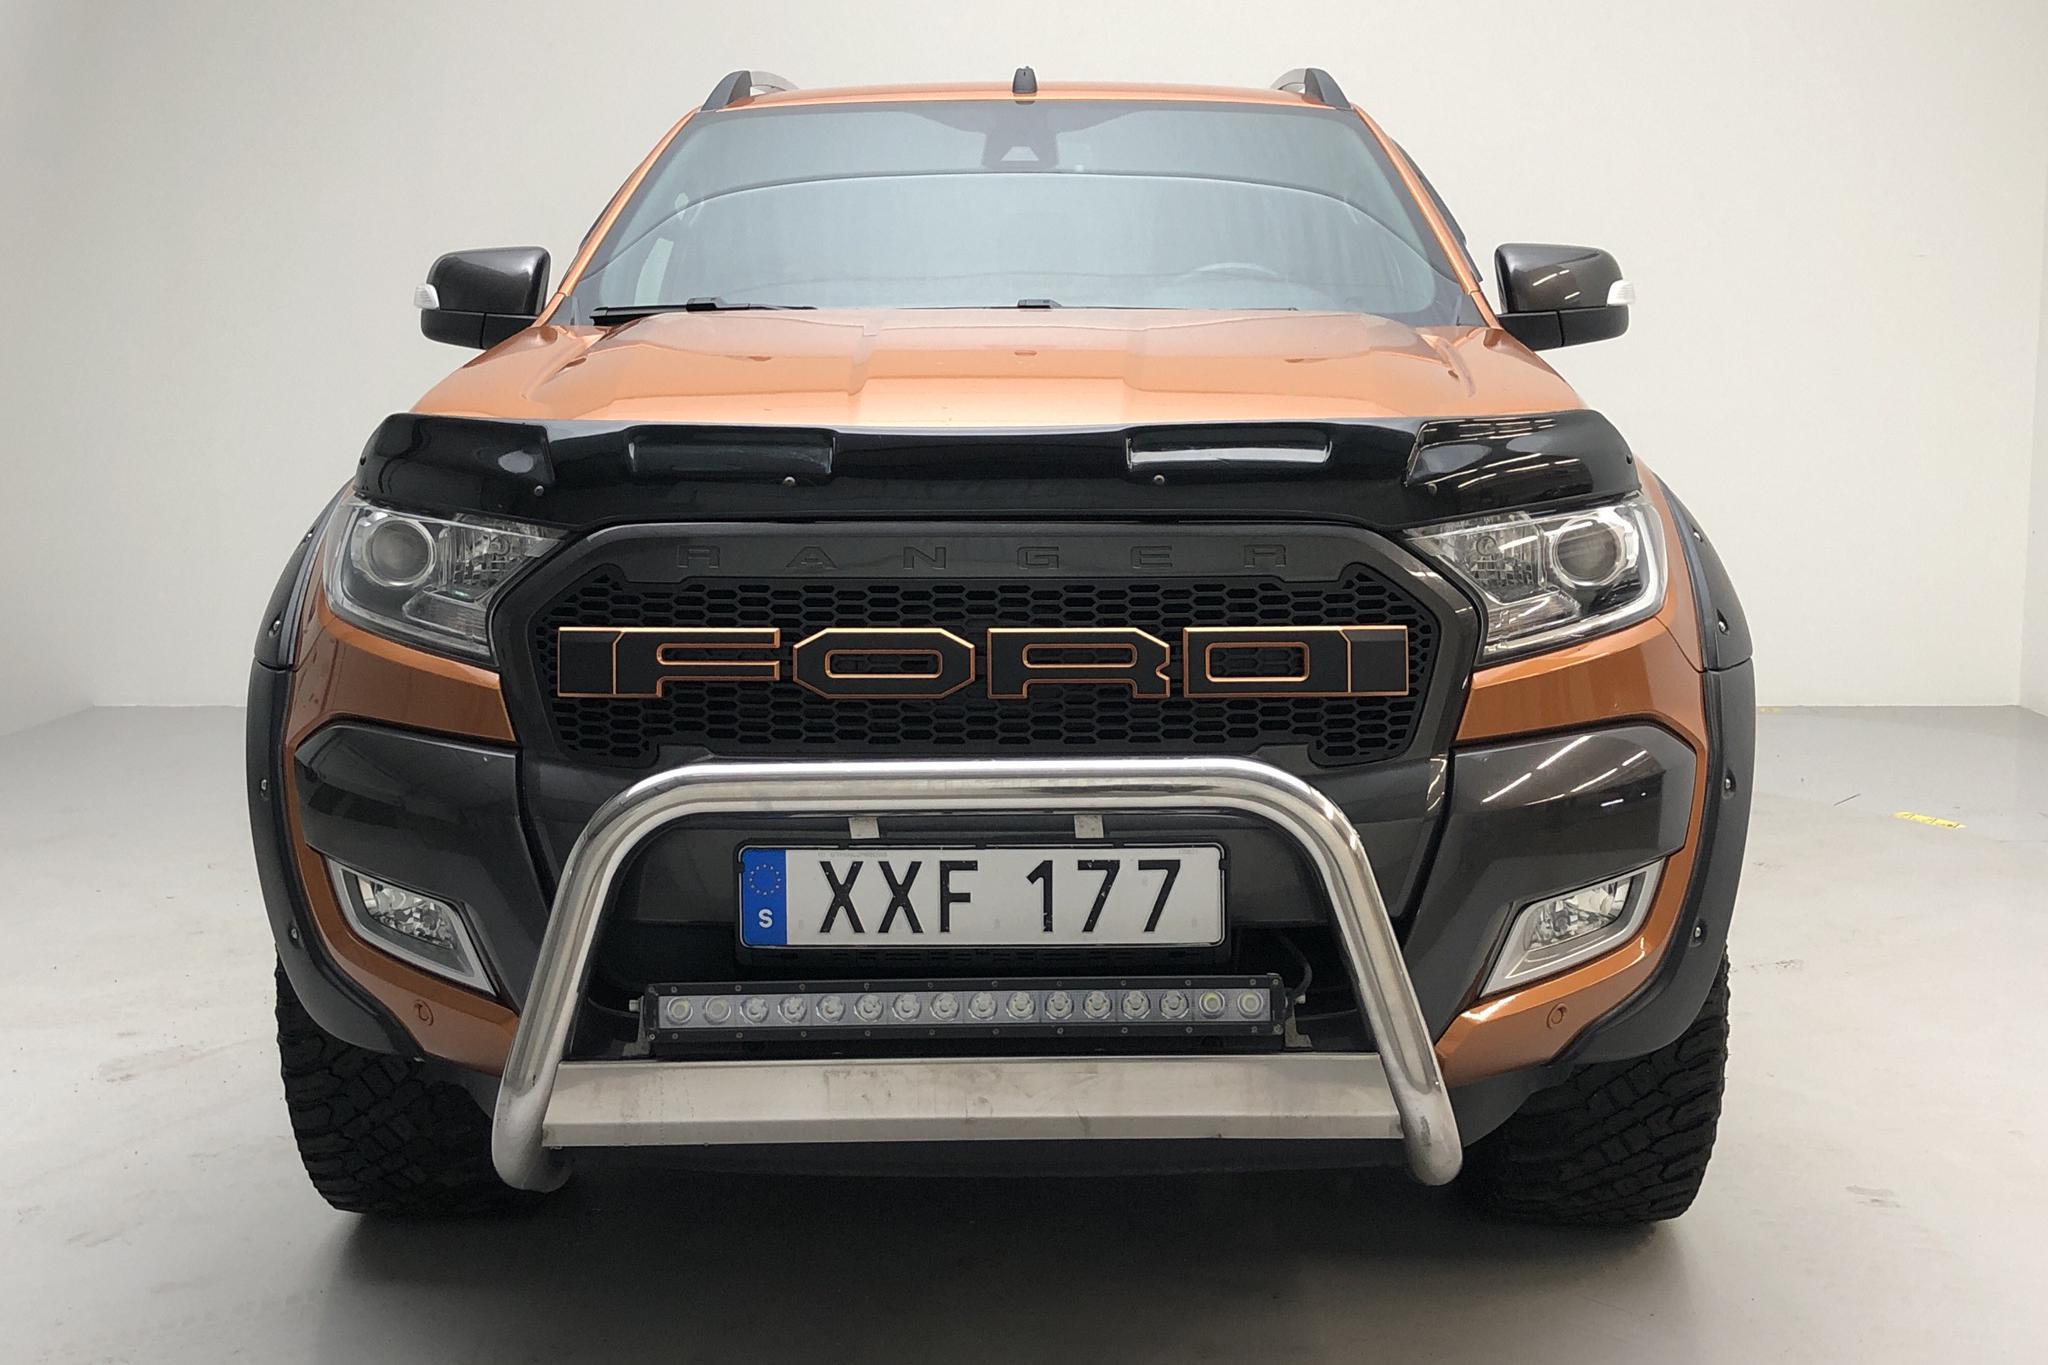 Ford Ranger 3.2 TDCi 4WD (200hk) - 12 849 mil - Automat - orange - 2017